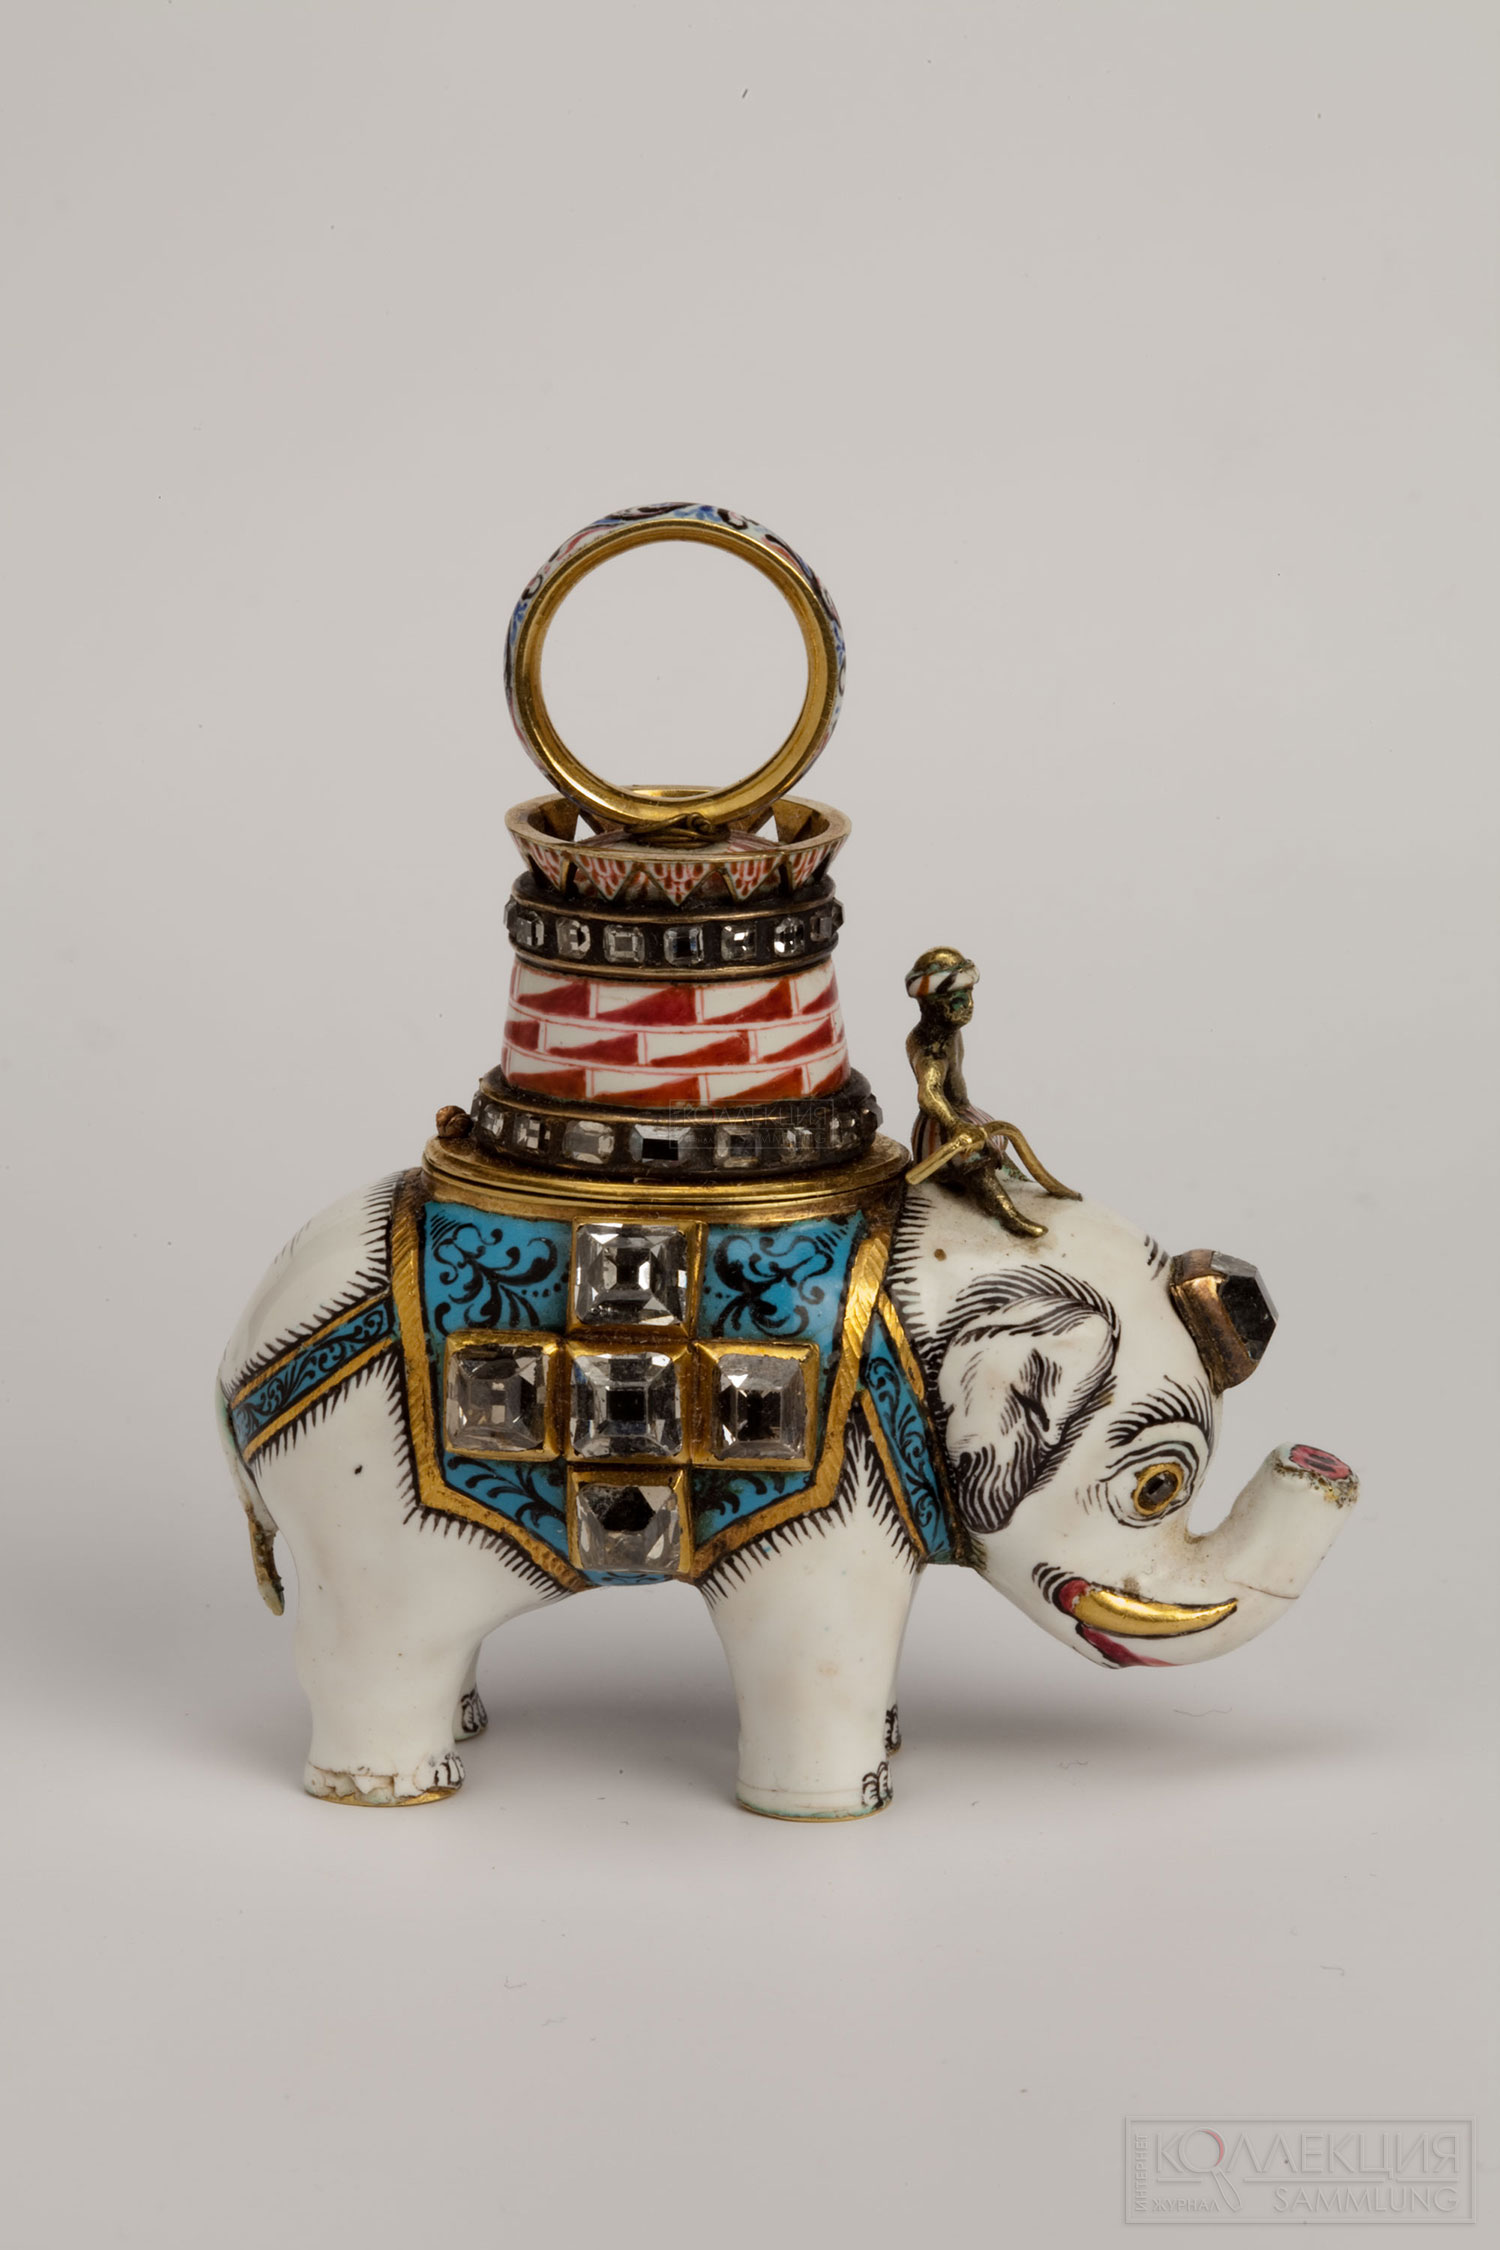 The Order of the Elephant Знак Ордена Слога «Фредерика VI», начало 1860-х гг.